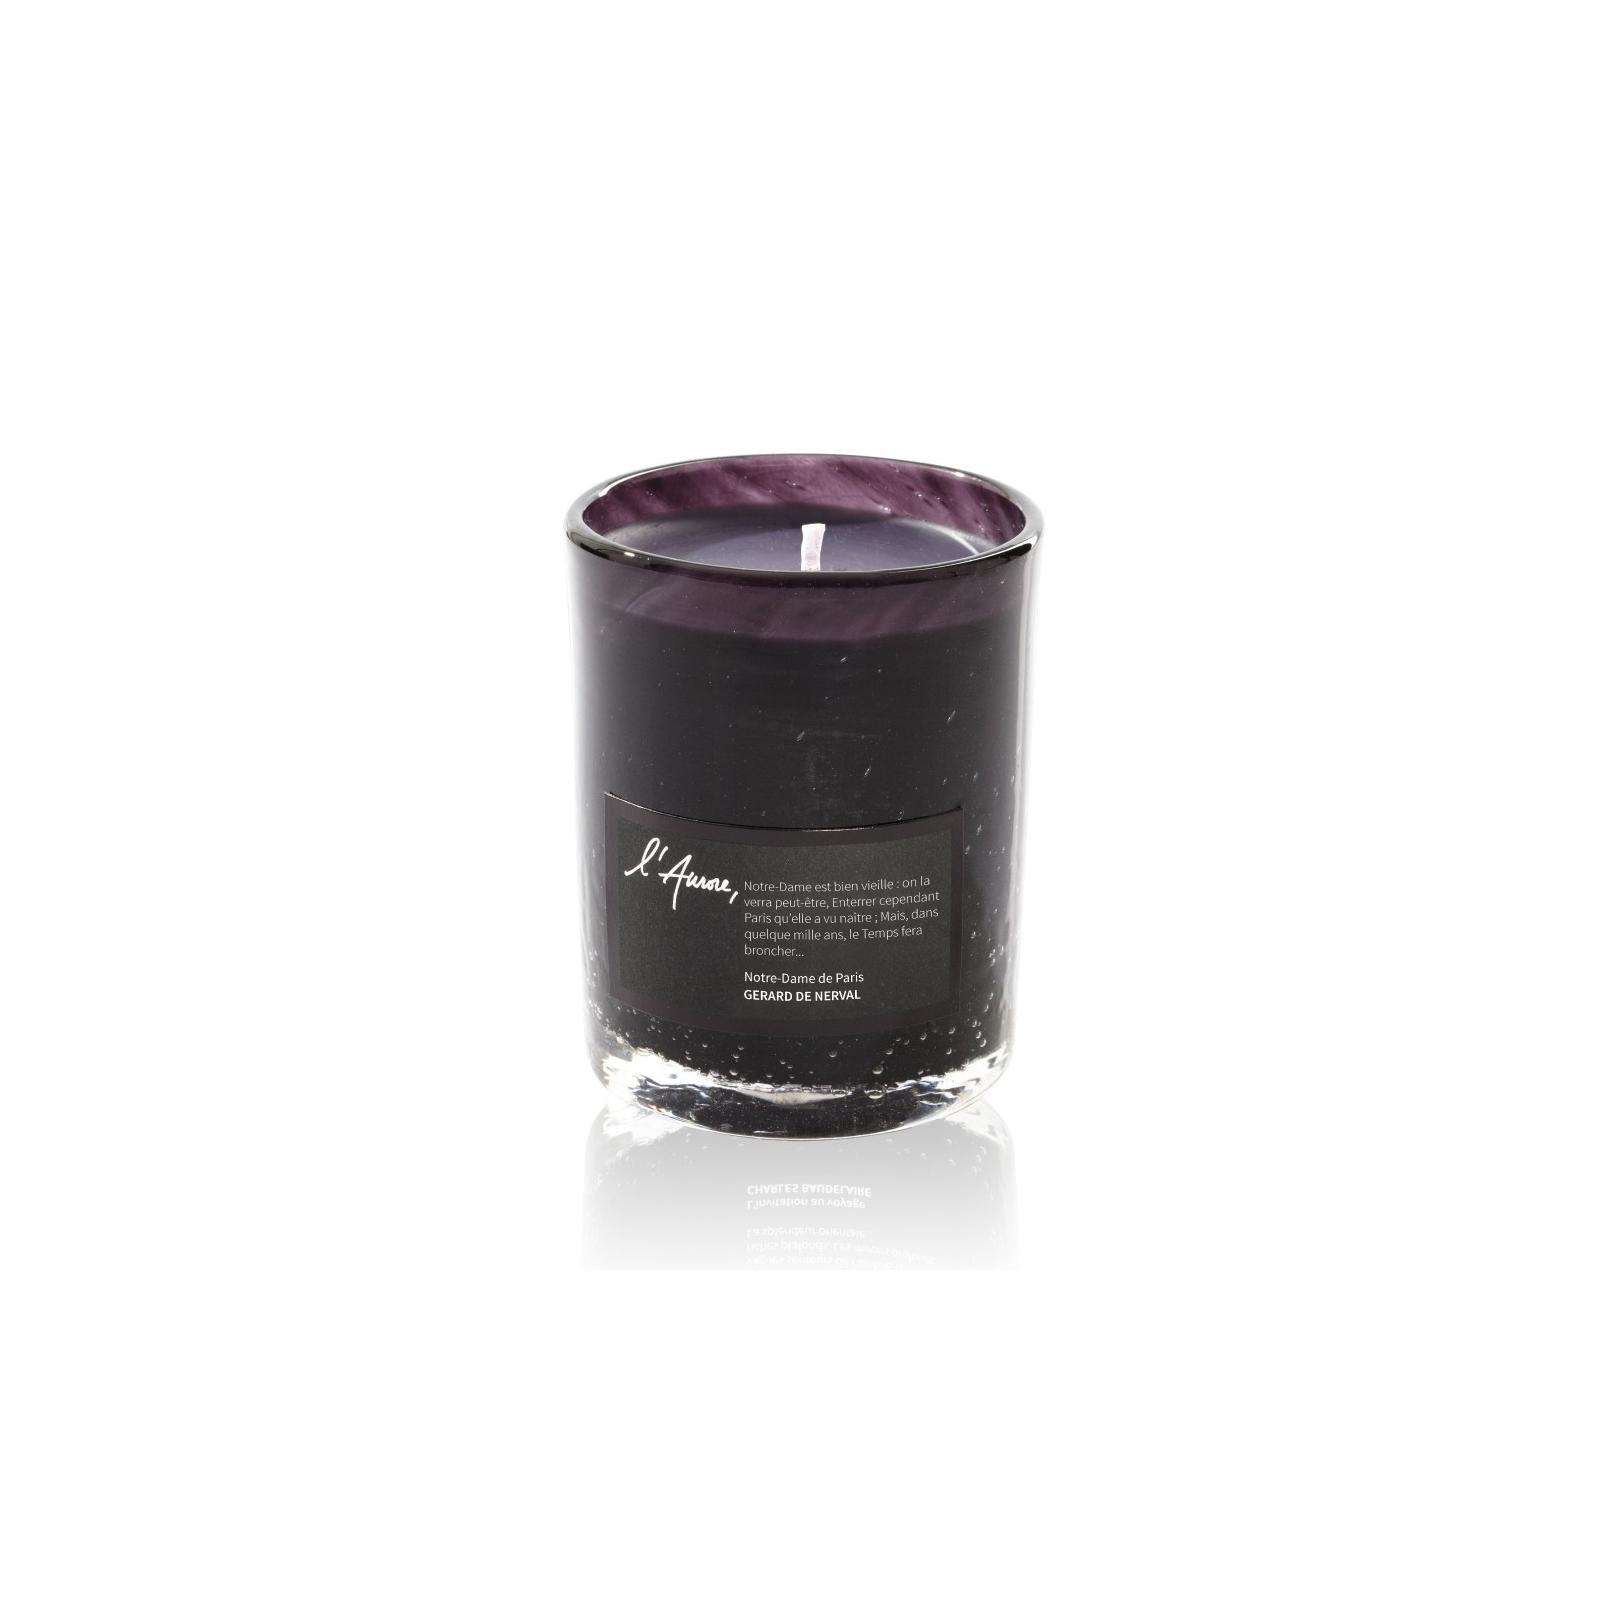 Scented candle NOTRE DAME (vanilla, patchouli, papyrus)